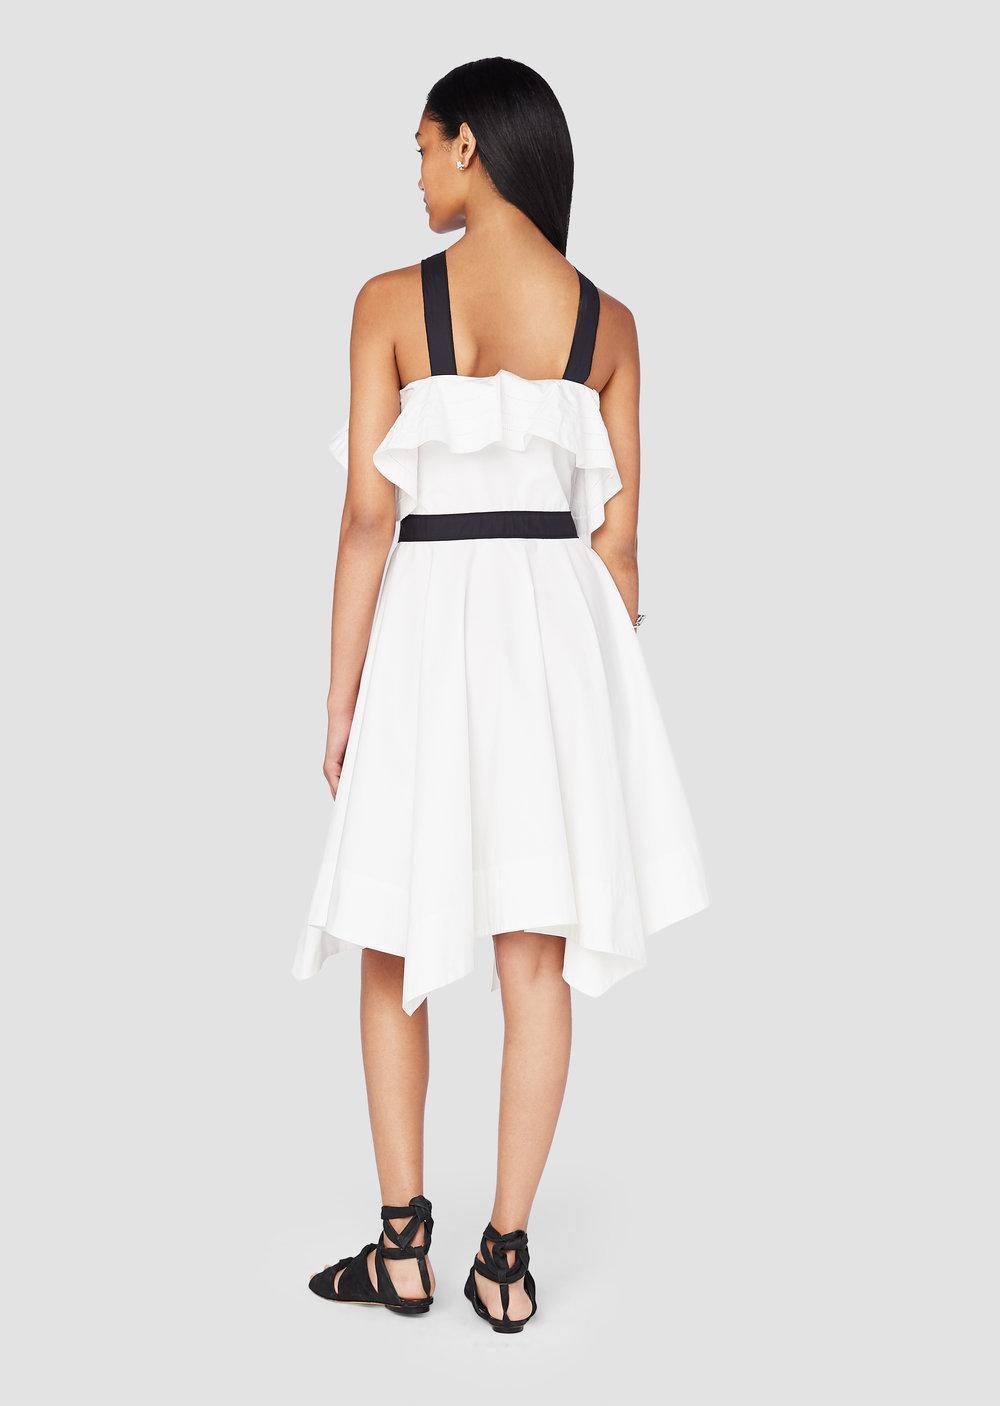 Off The Shoulder Halter Dress - White Derek Lam JOcBforu5B